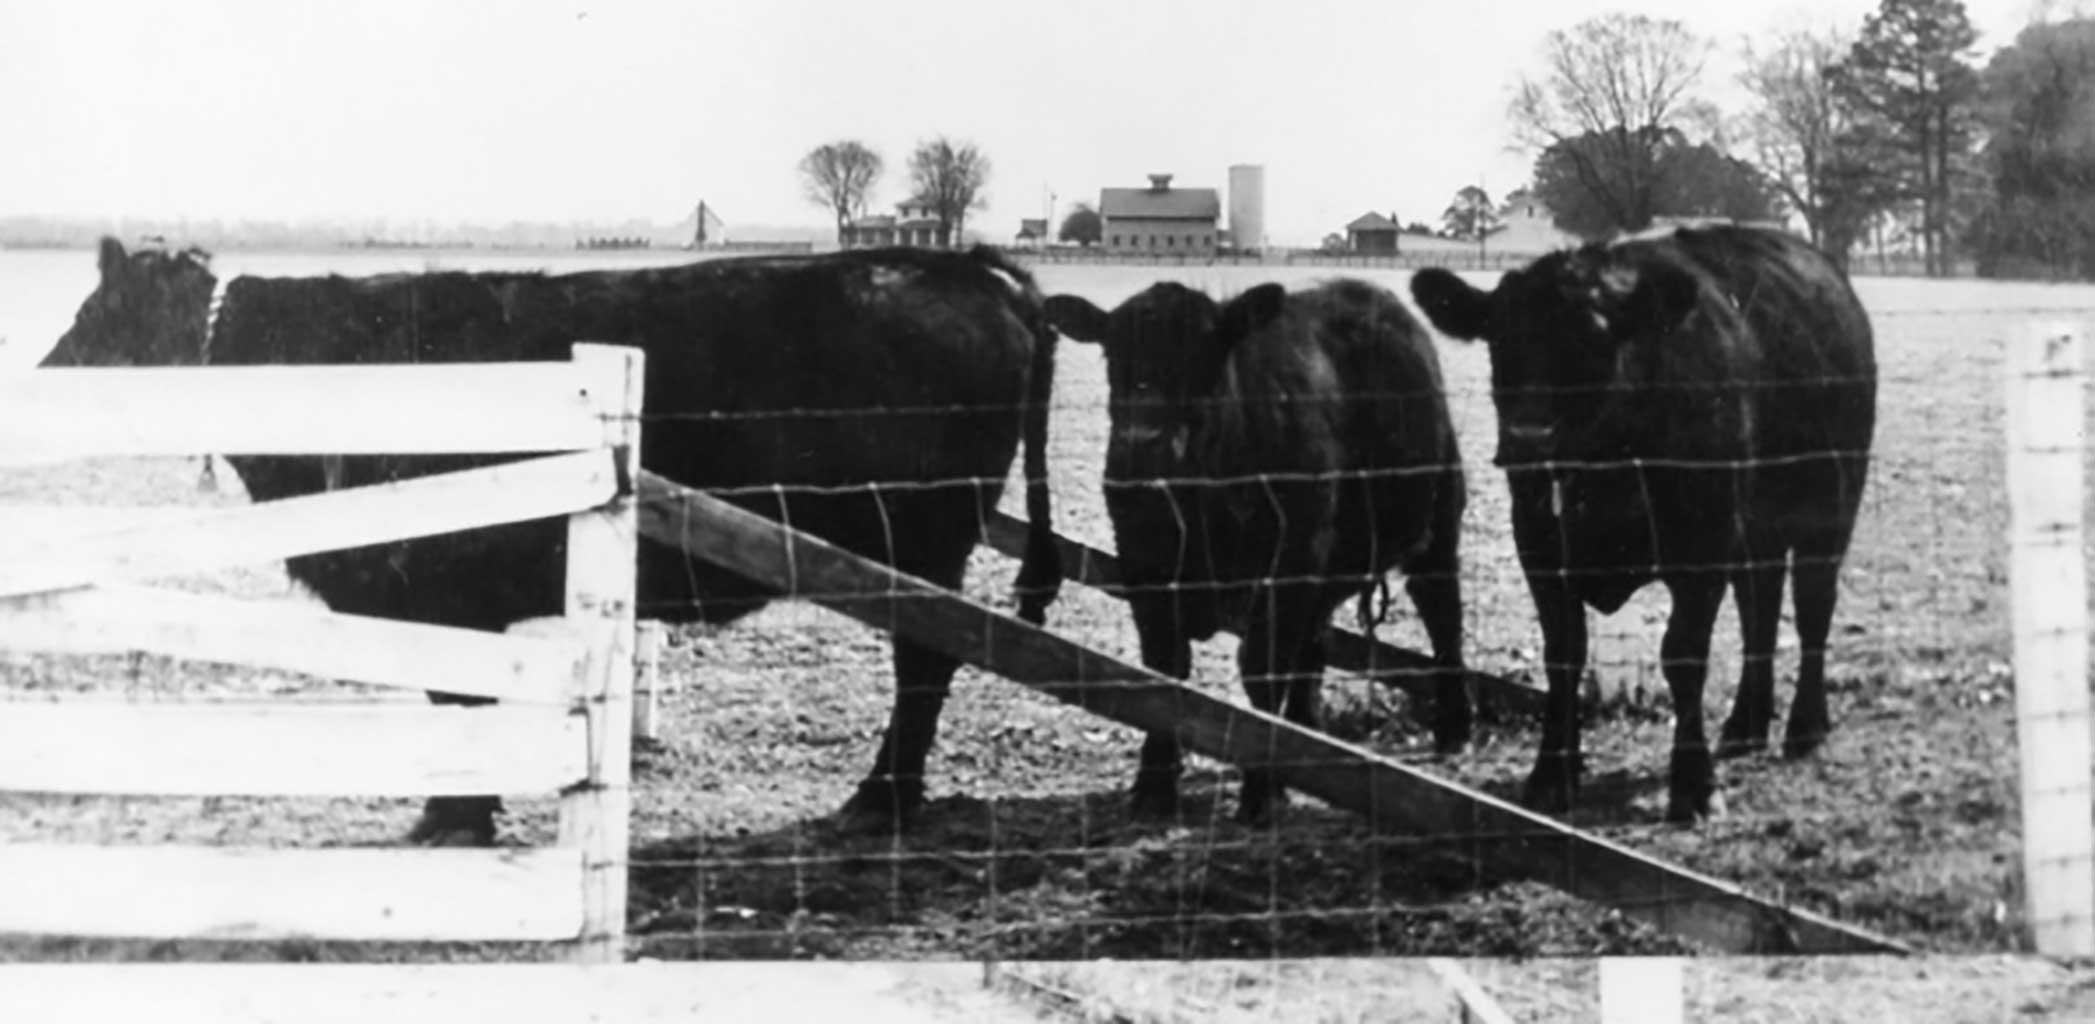 black-angus-on-butts-farm-img158